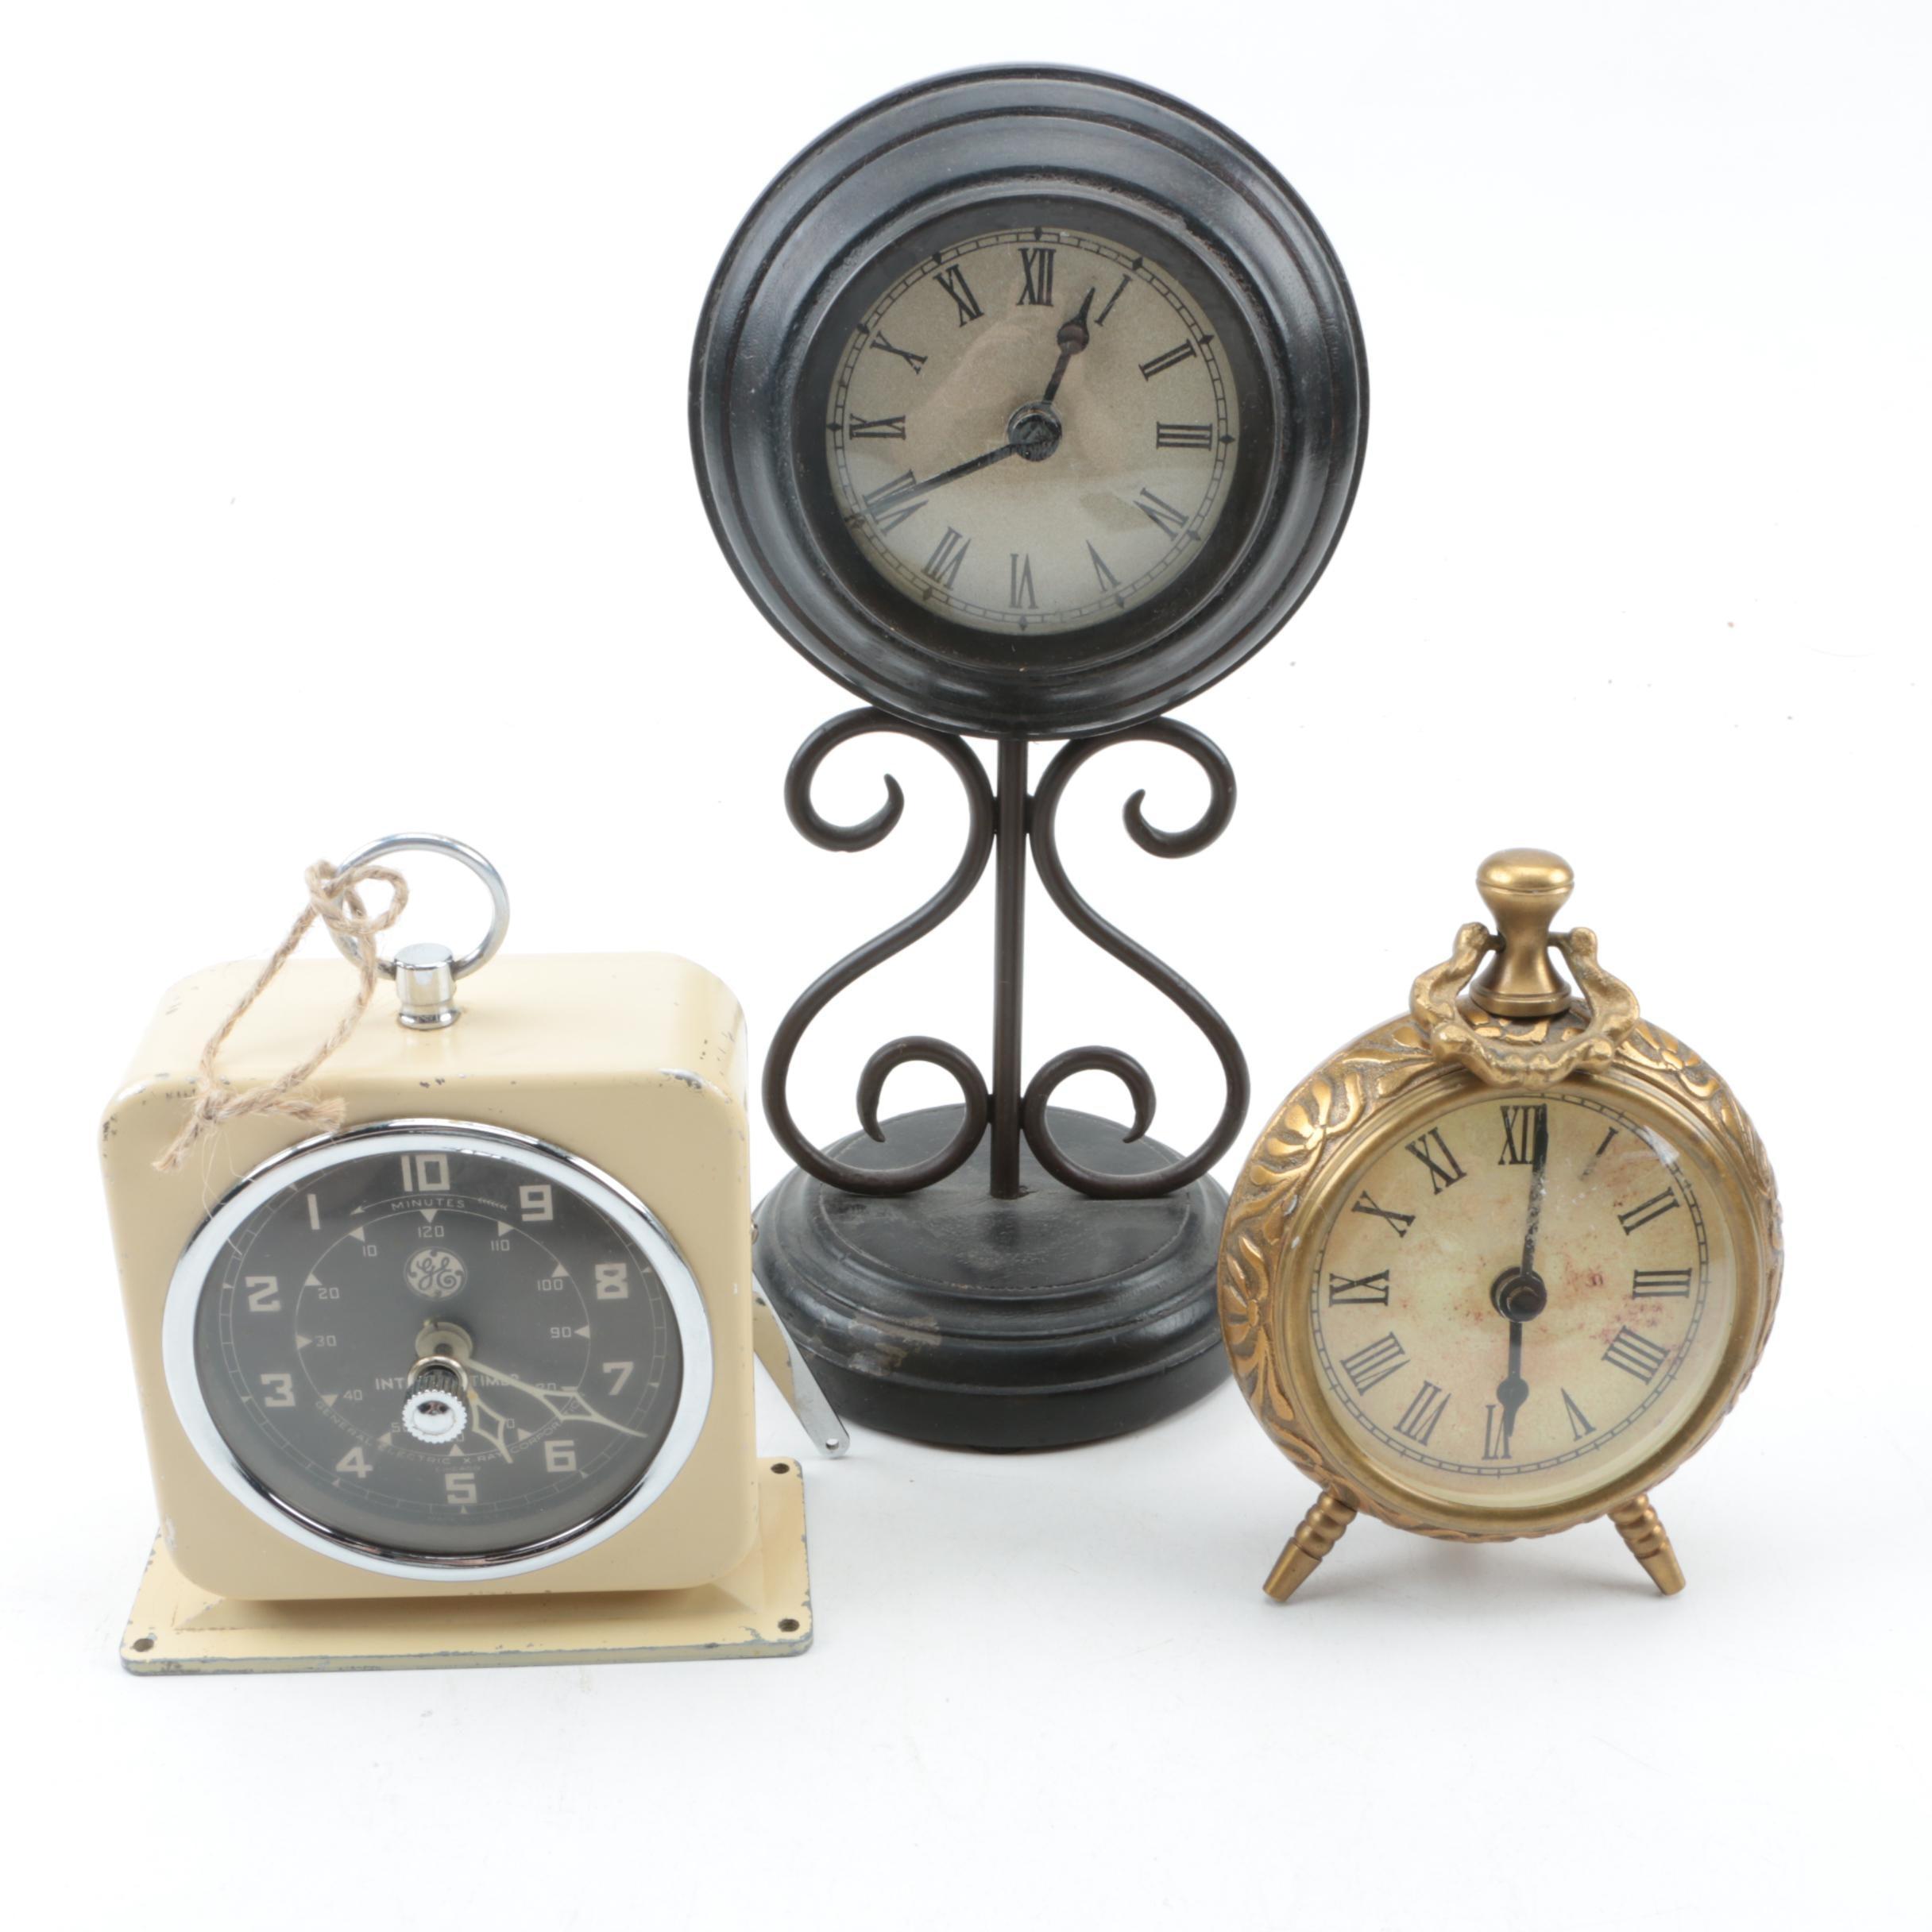 Vintage Shelf Clocks Featuring GE